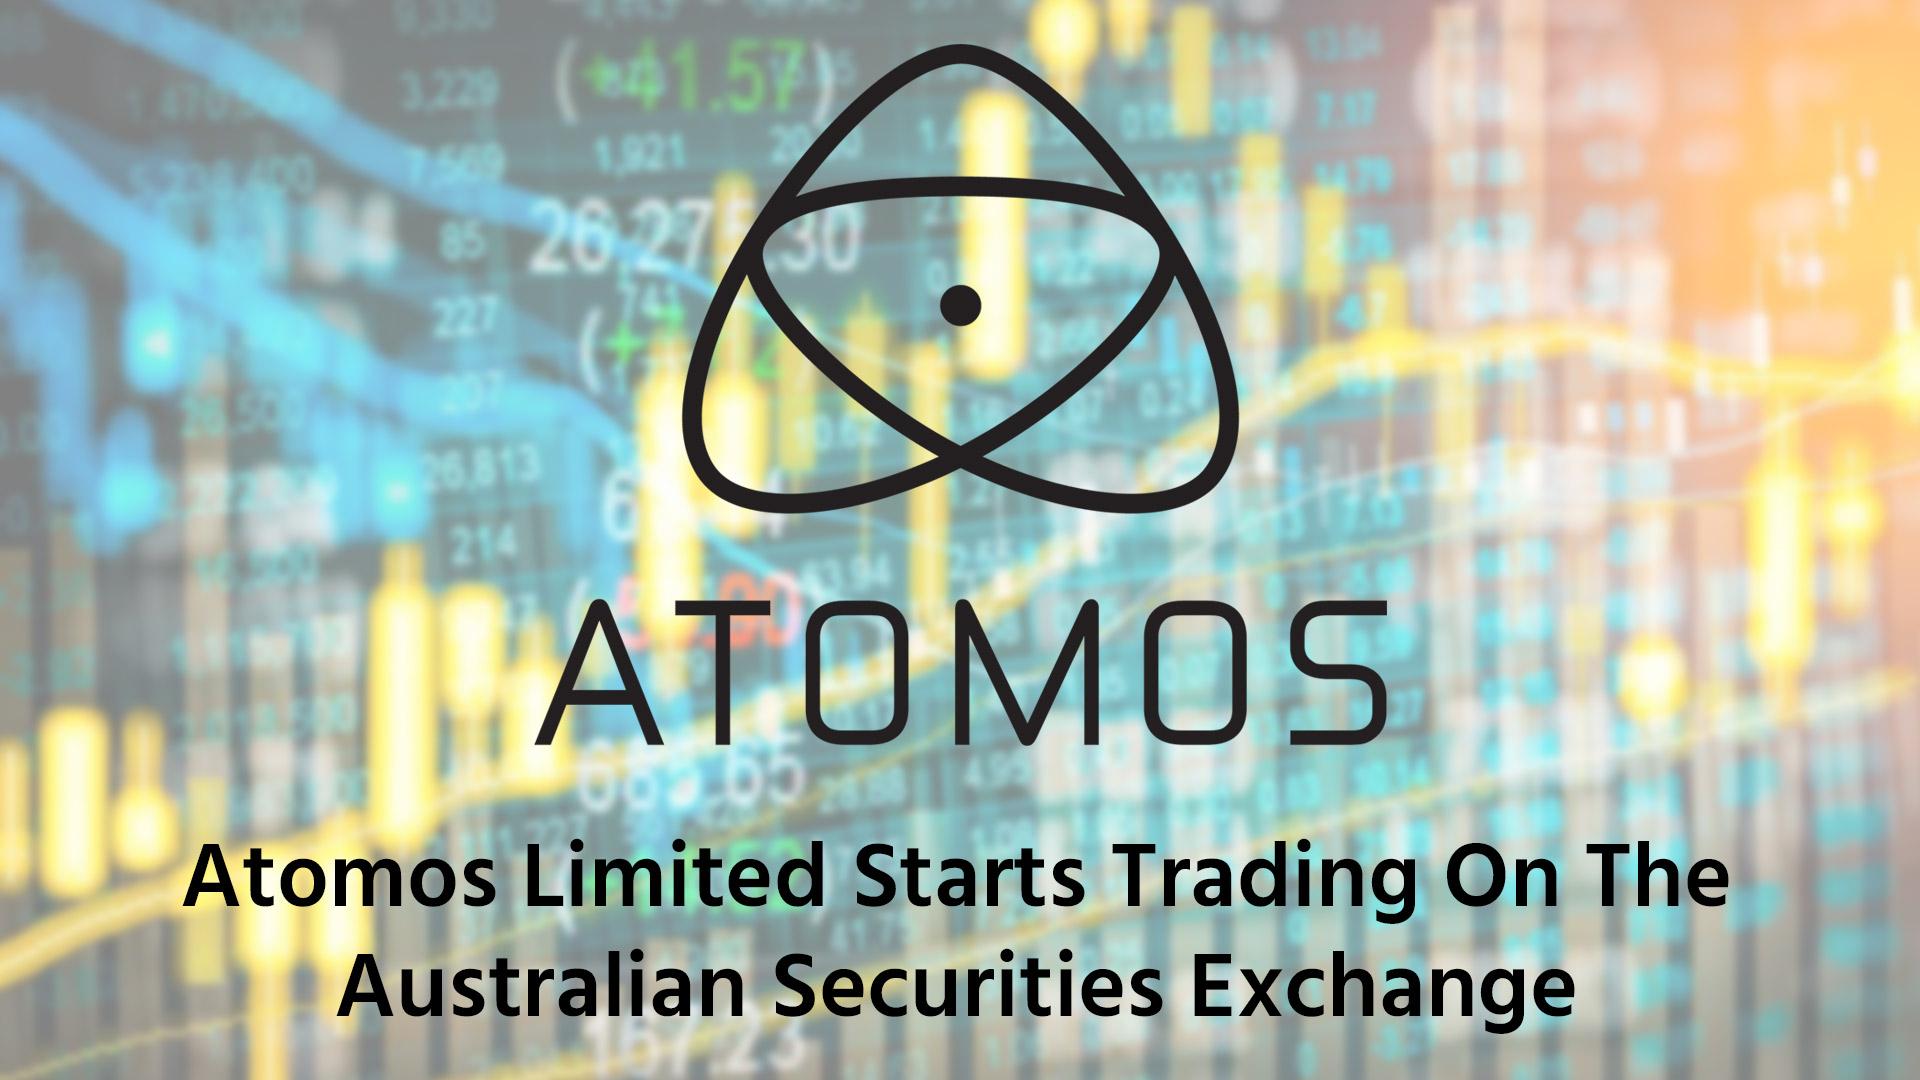 Atomosがオーストラリア証券取引所で取引を開始